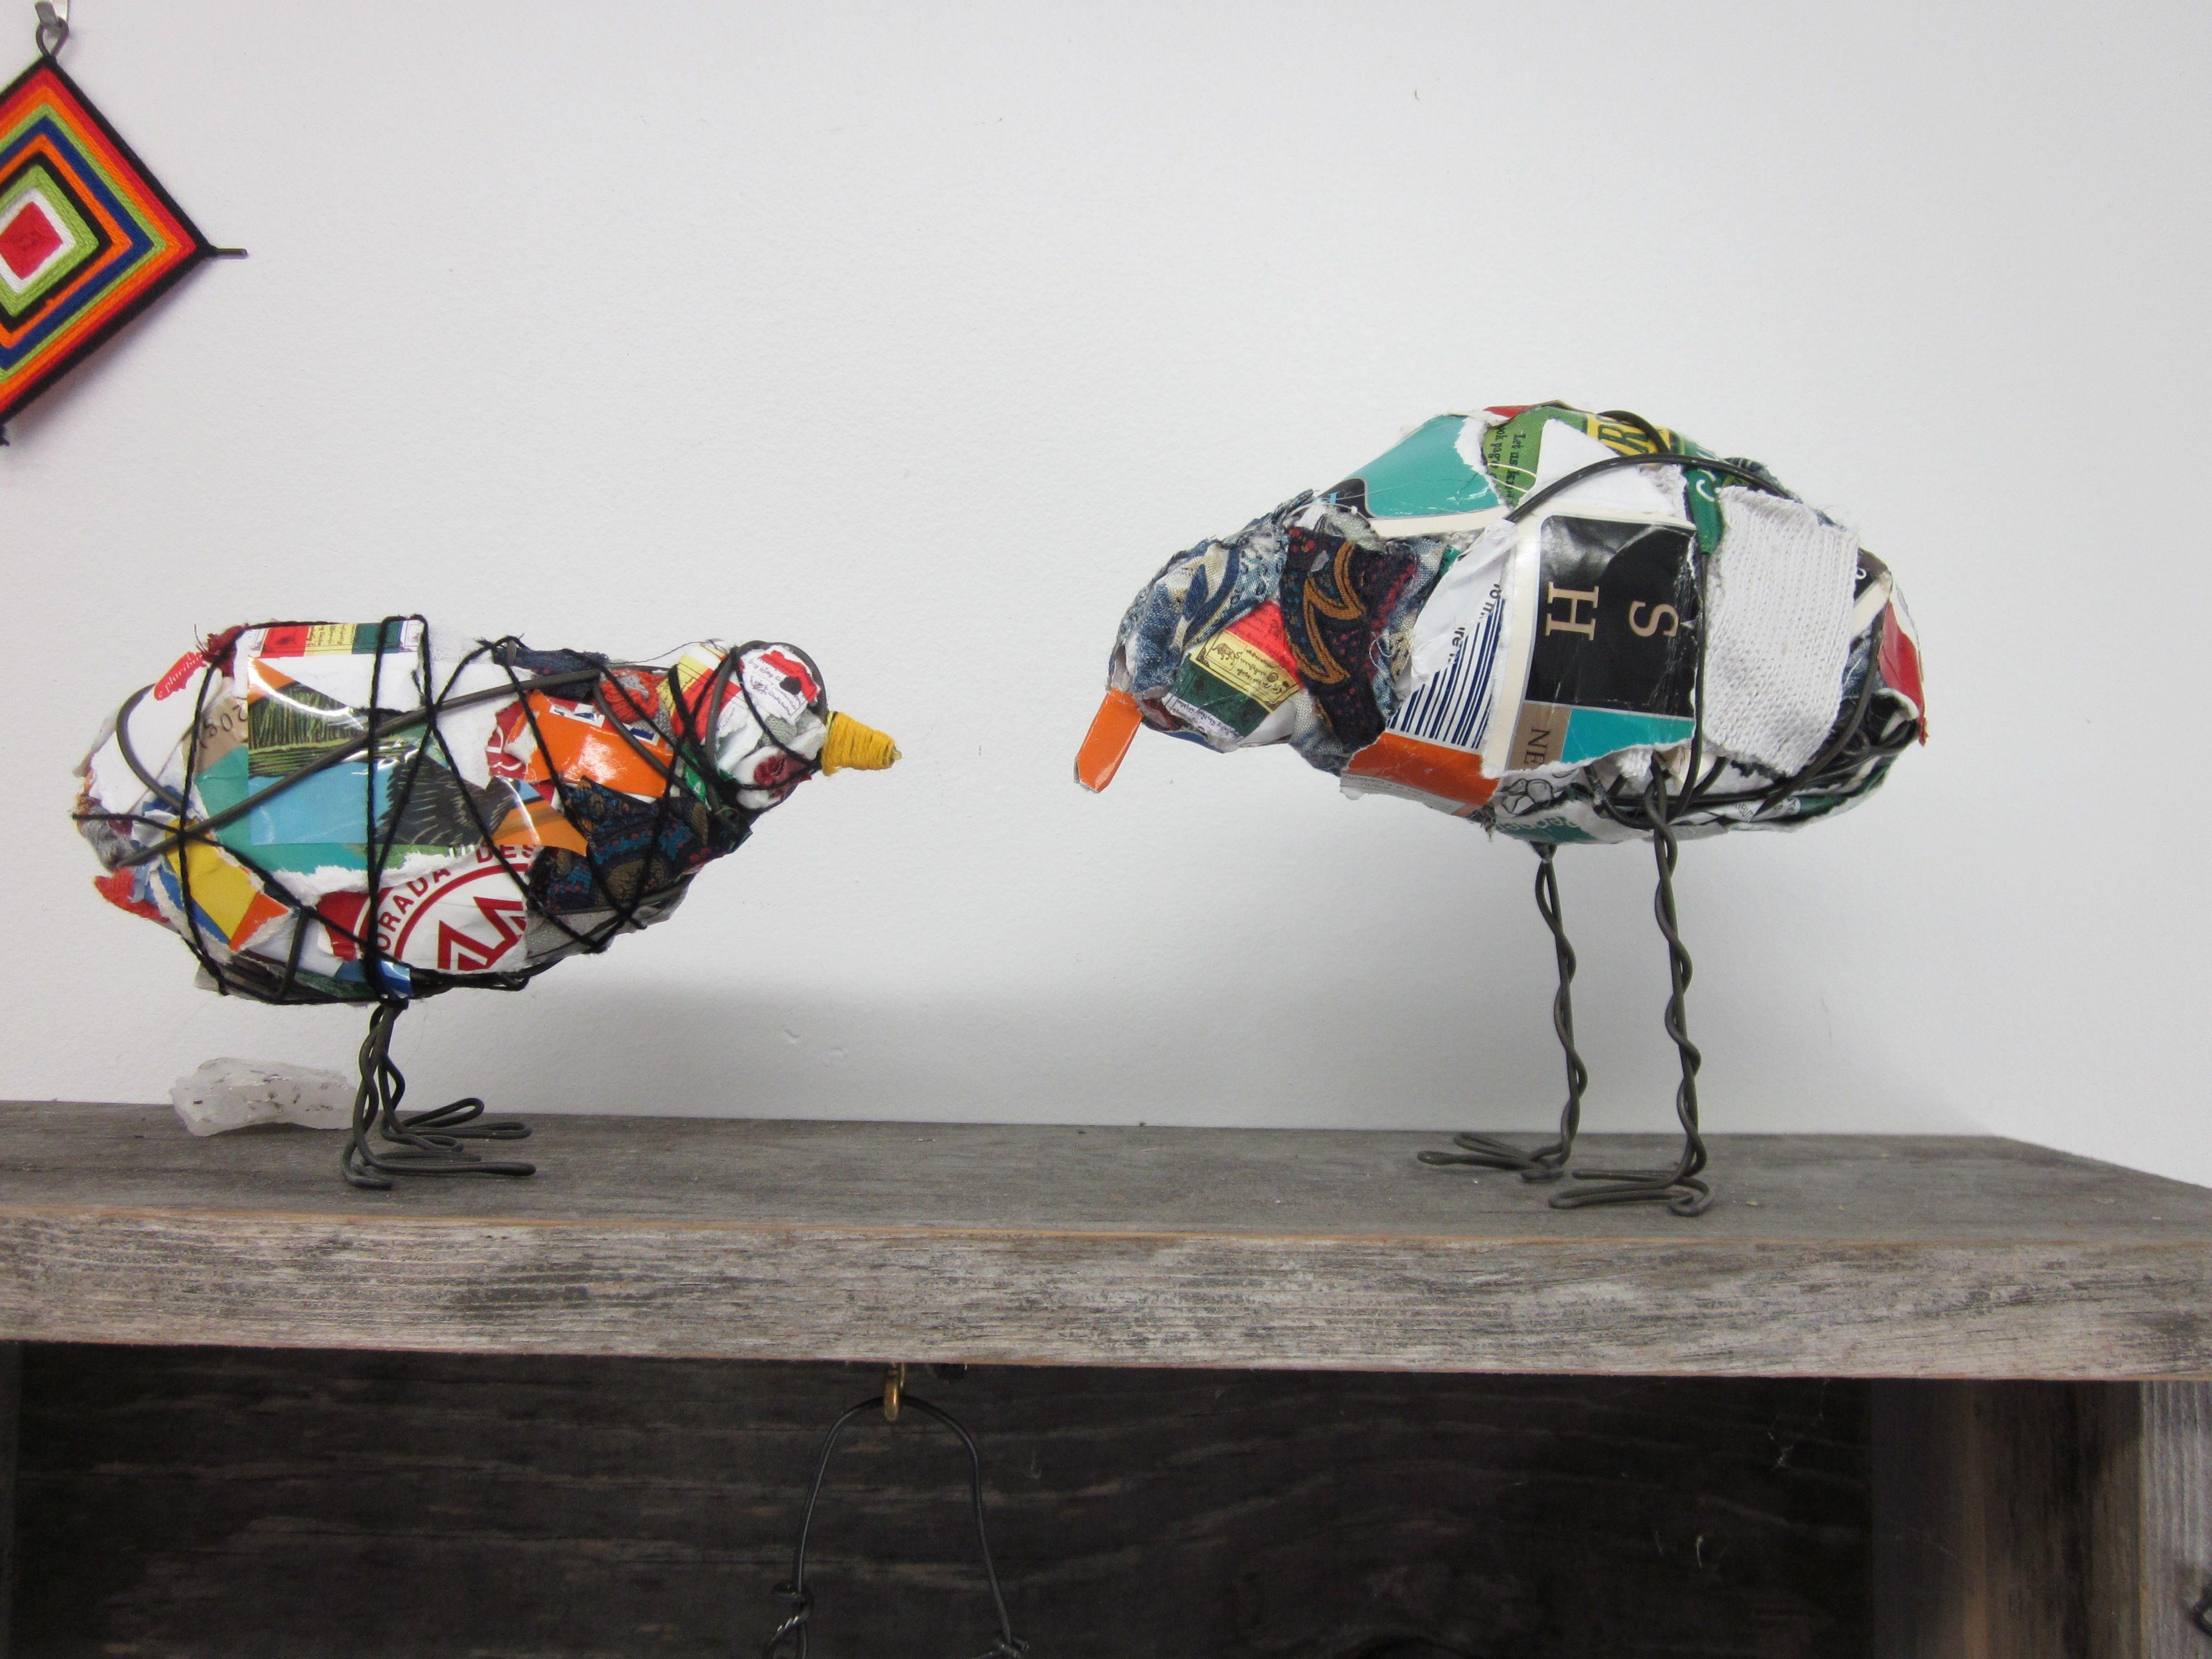 Trash to treasure: Man creates house models using recycled material